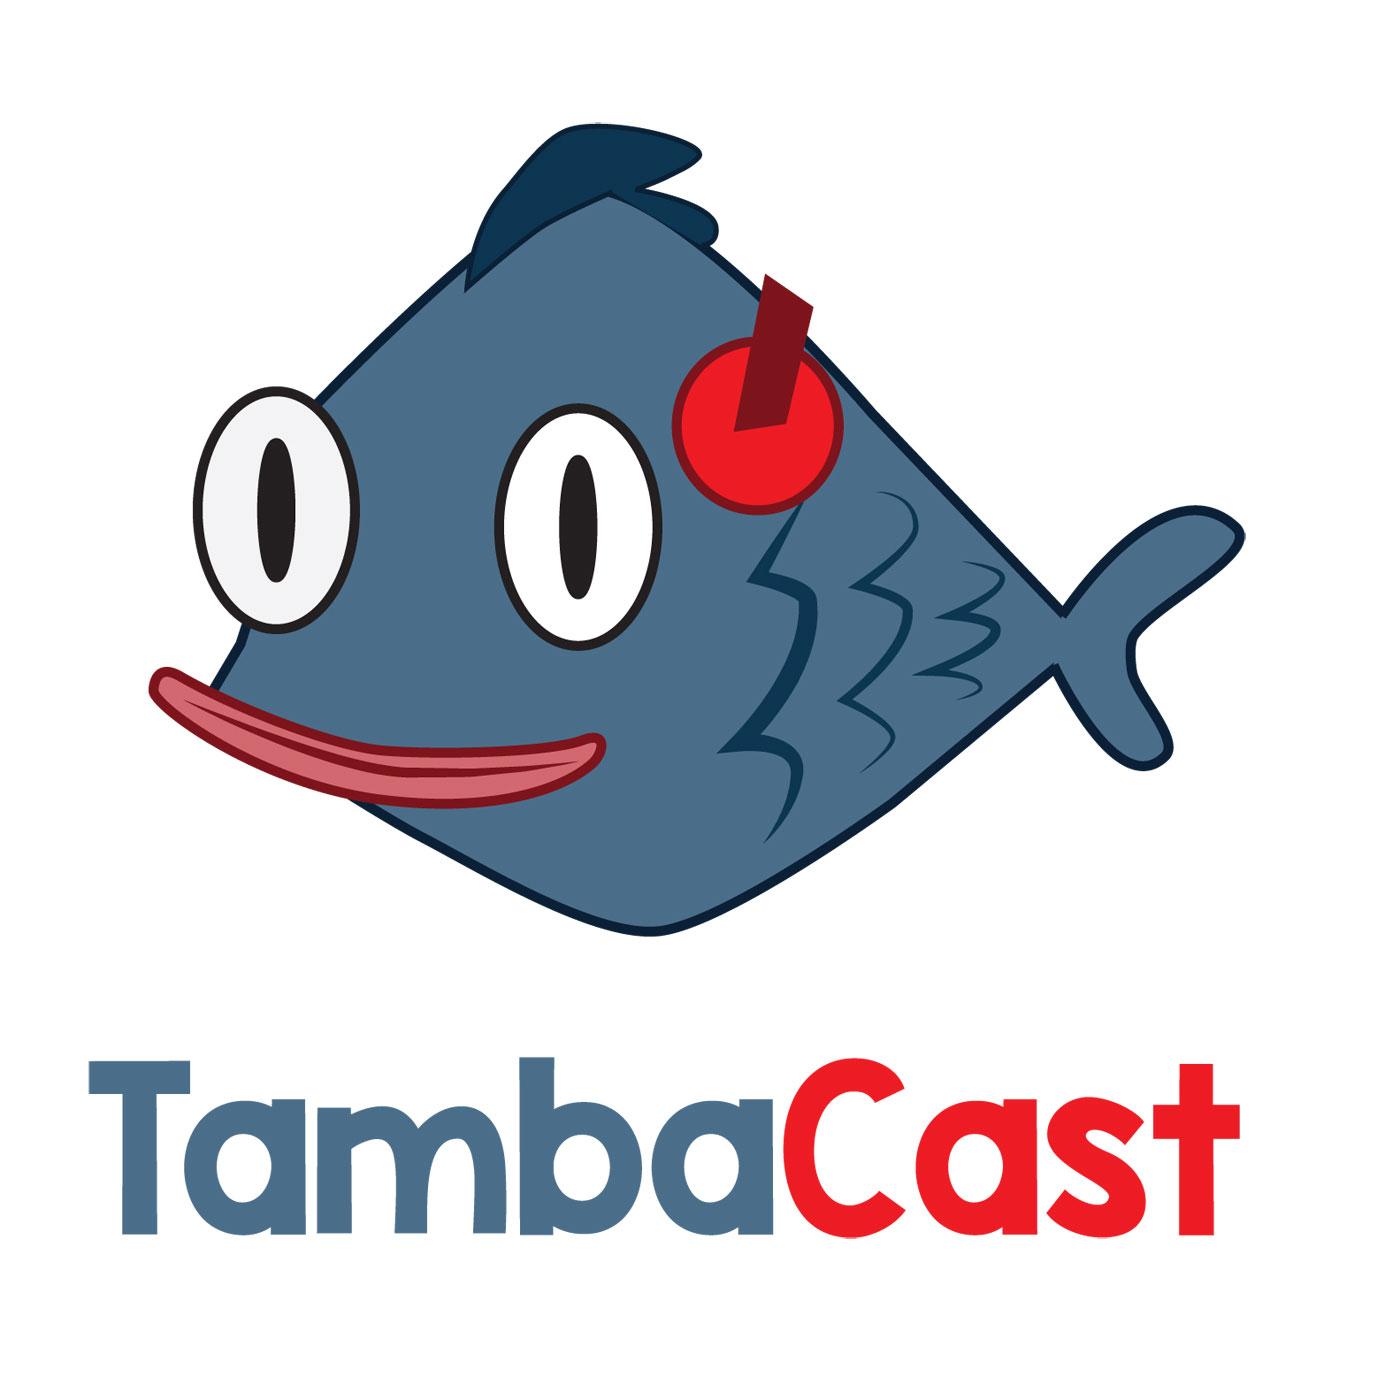 TambaCast